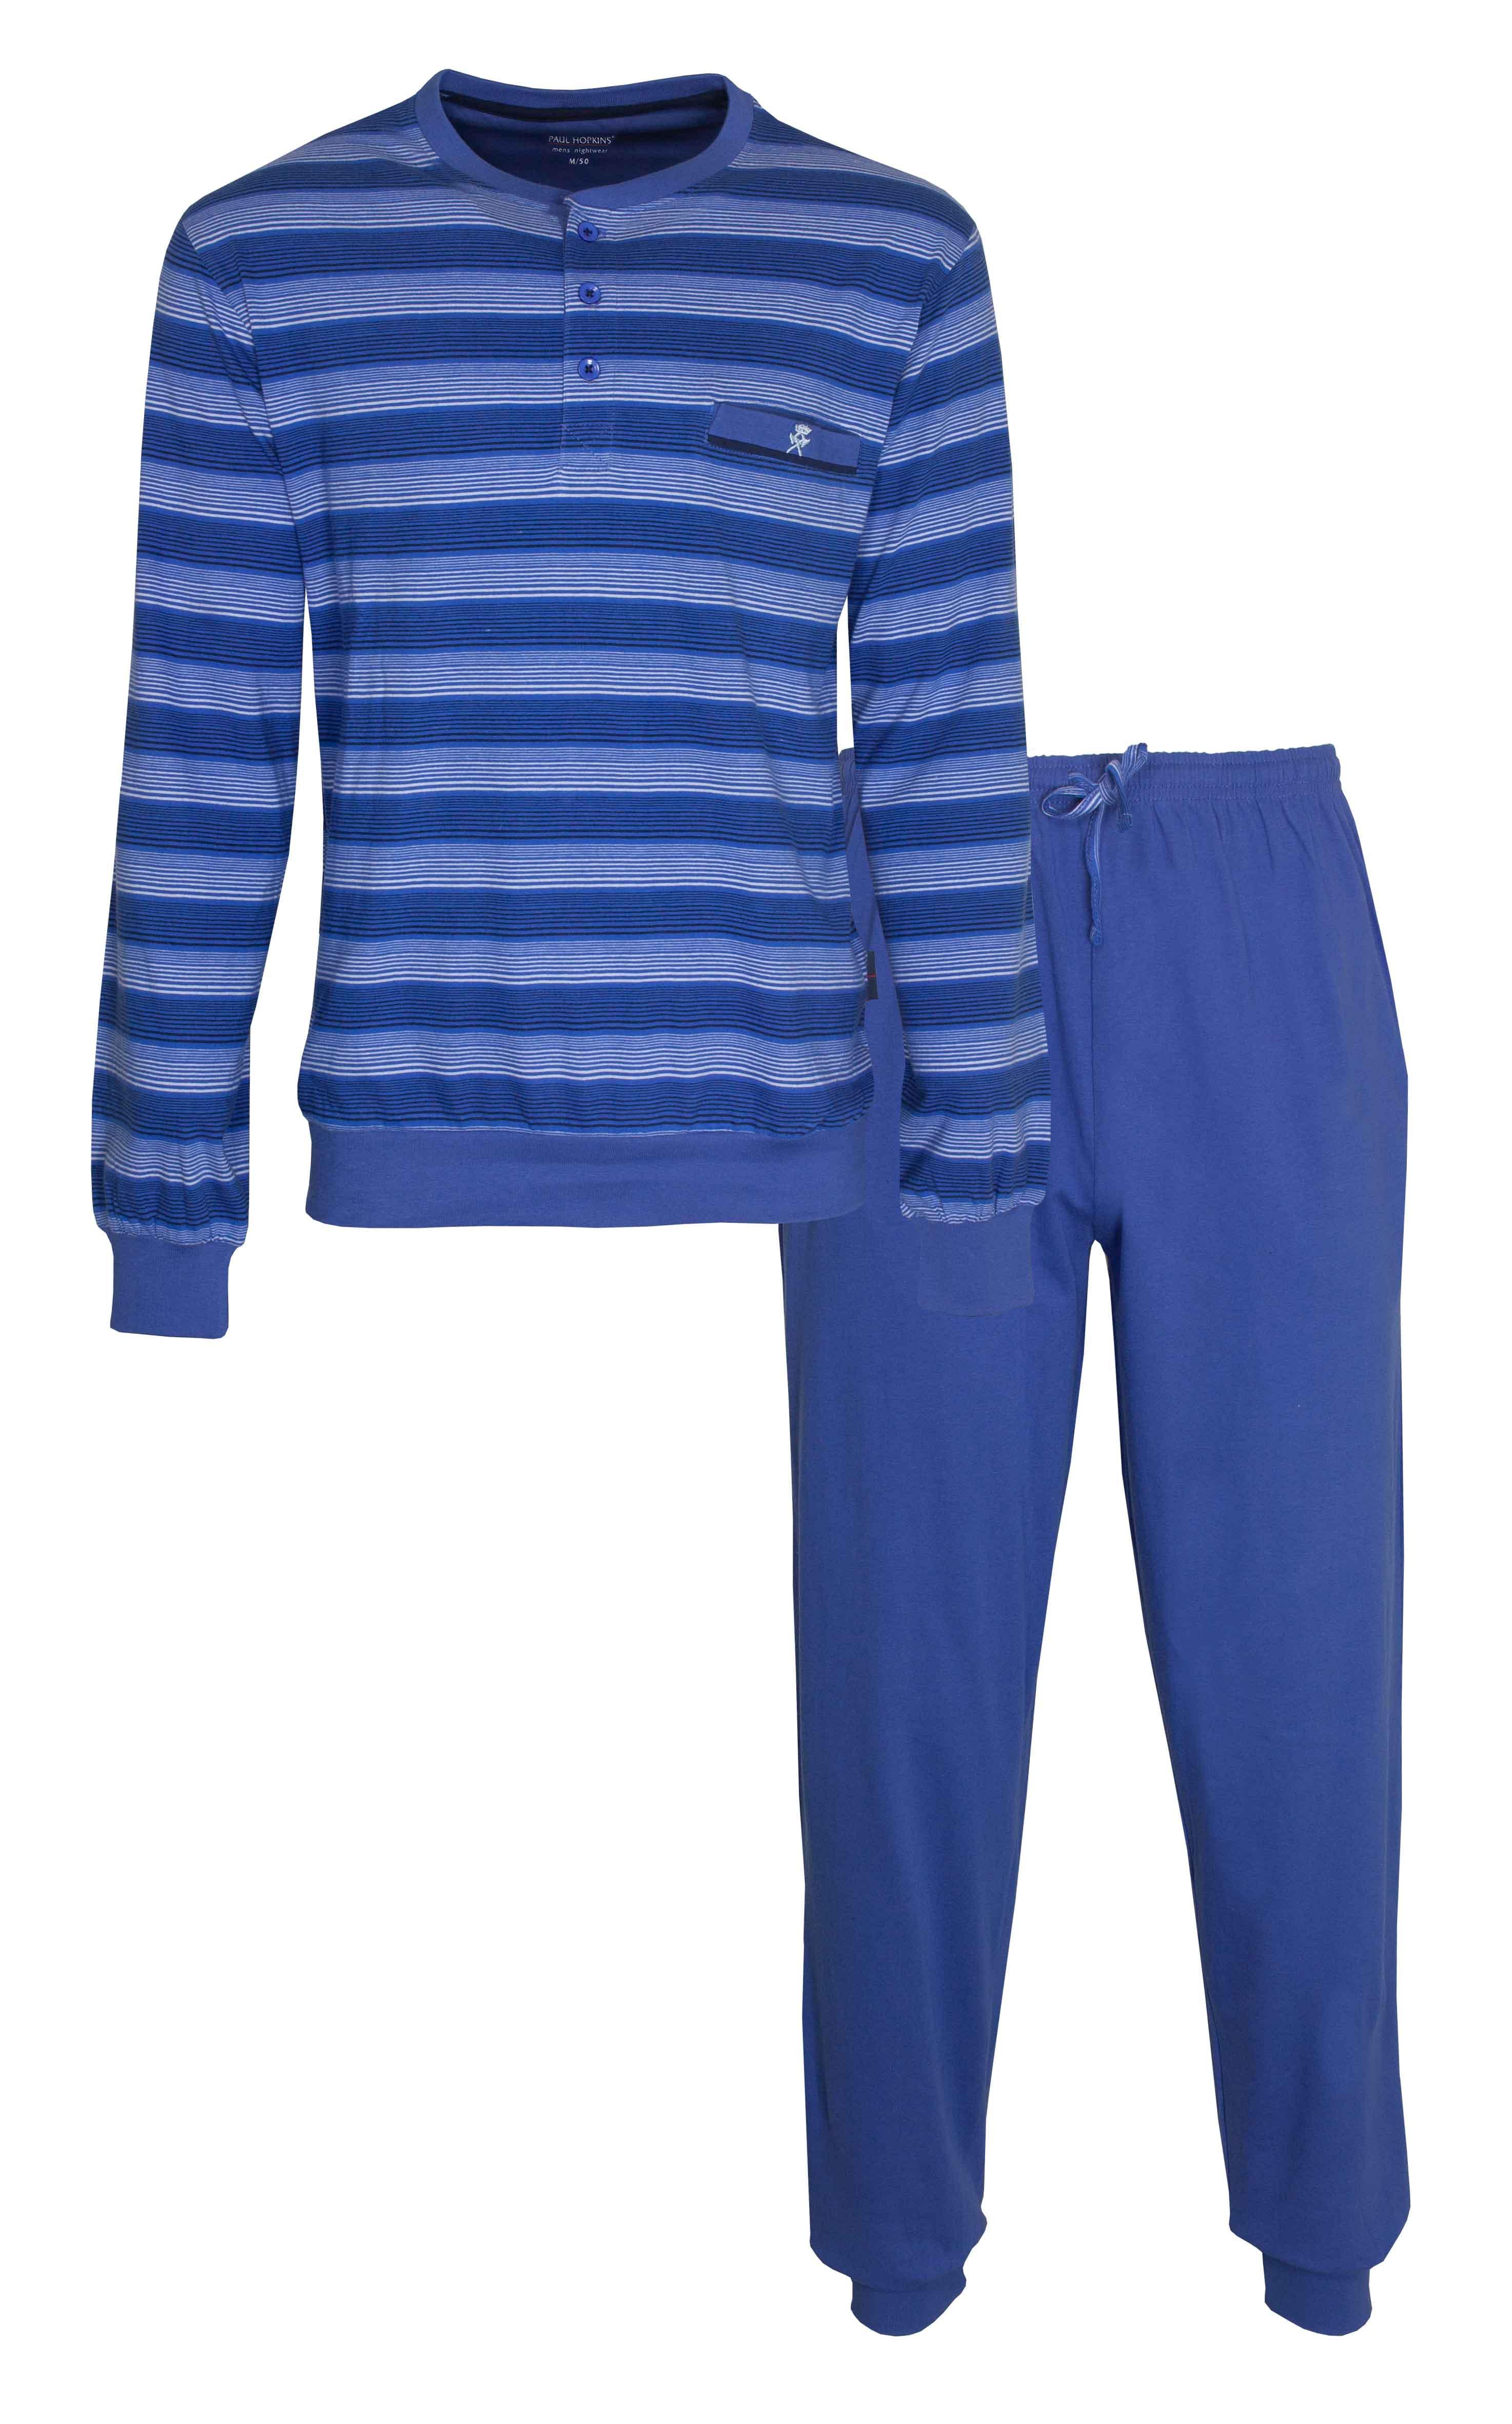 Heren pyjama PHPYH 1103A-L/52